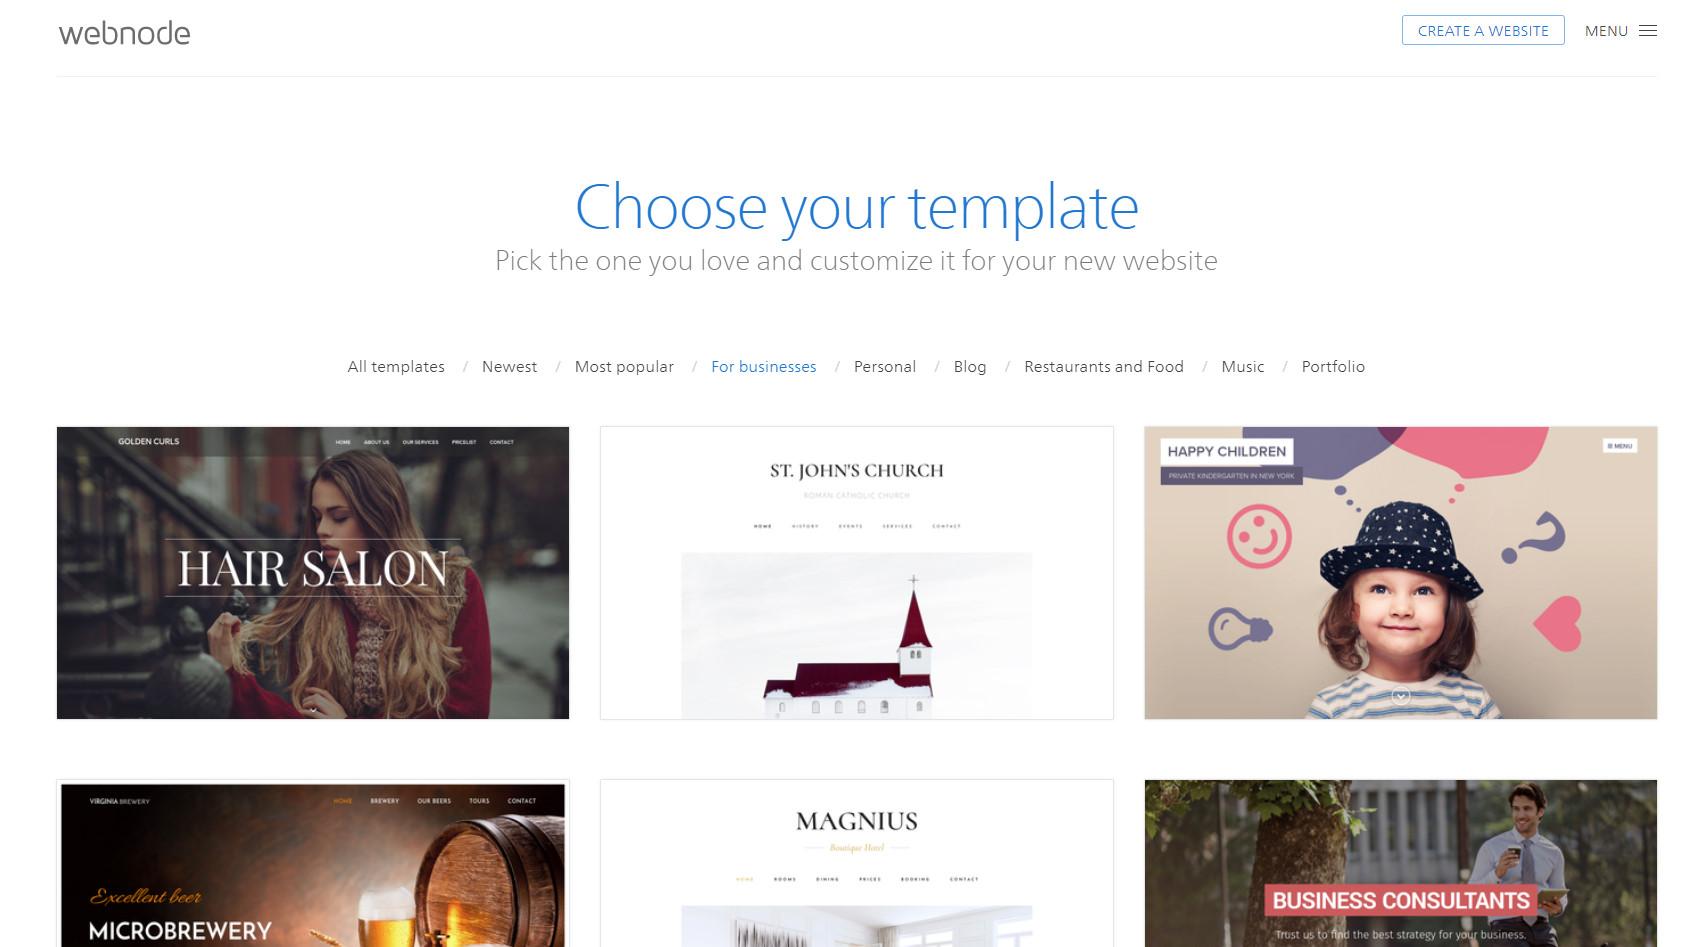 webnode blog, webnode reviews, webnode login